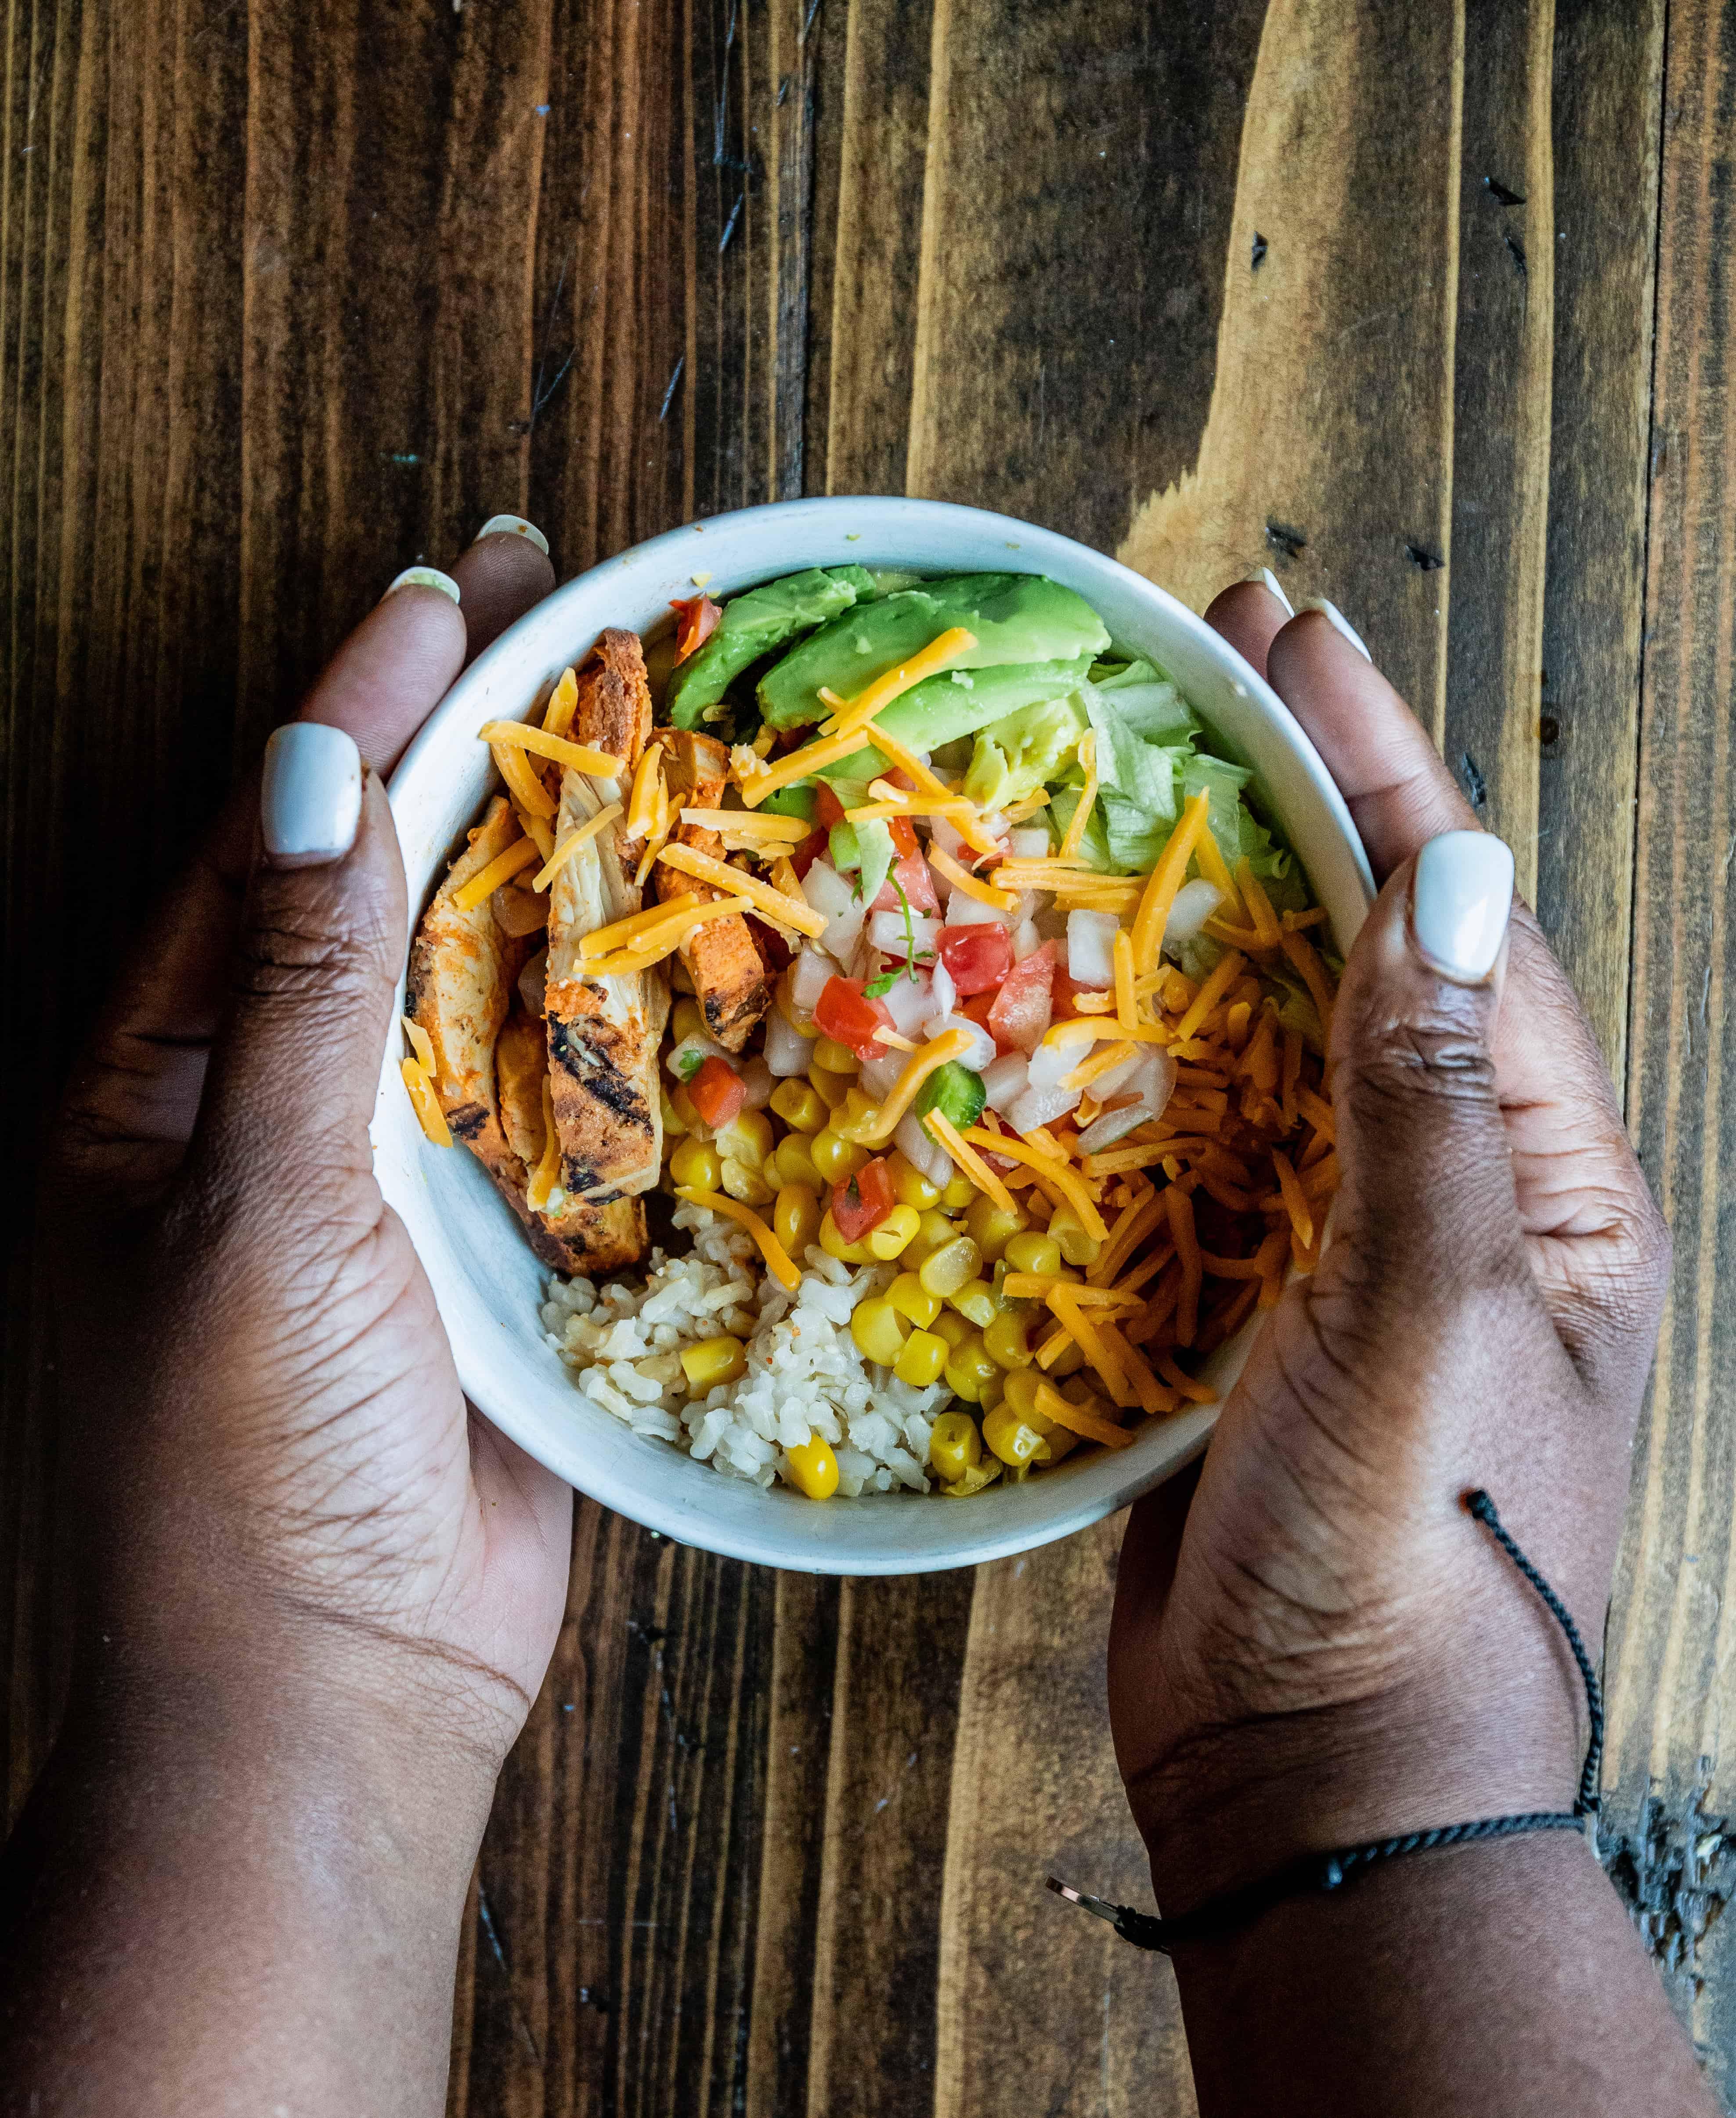 Easy Gluten Free Taco Bowl Recipe